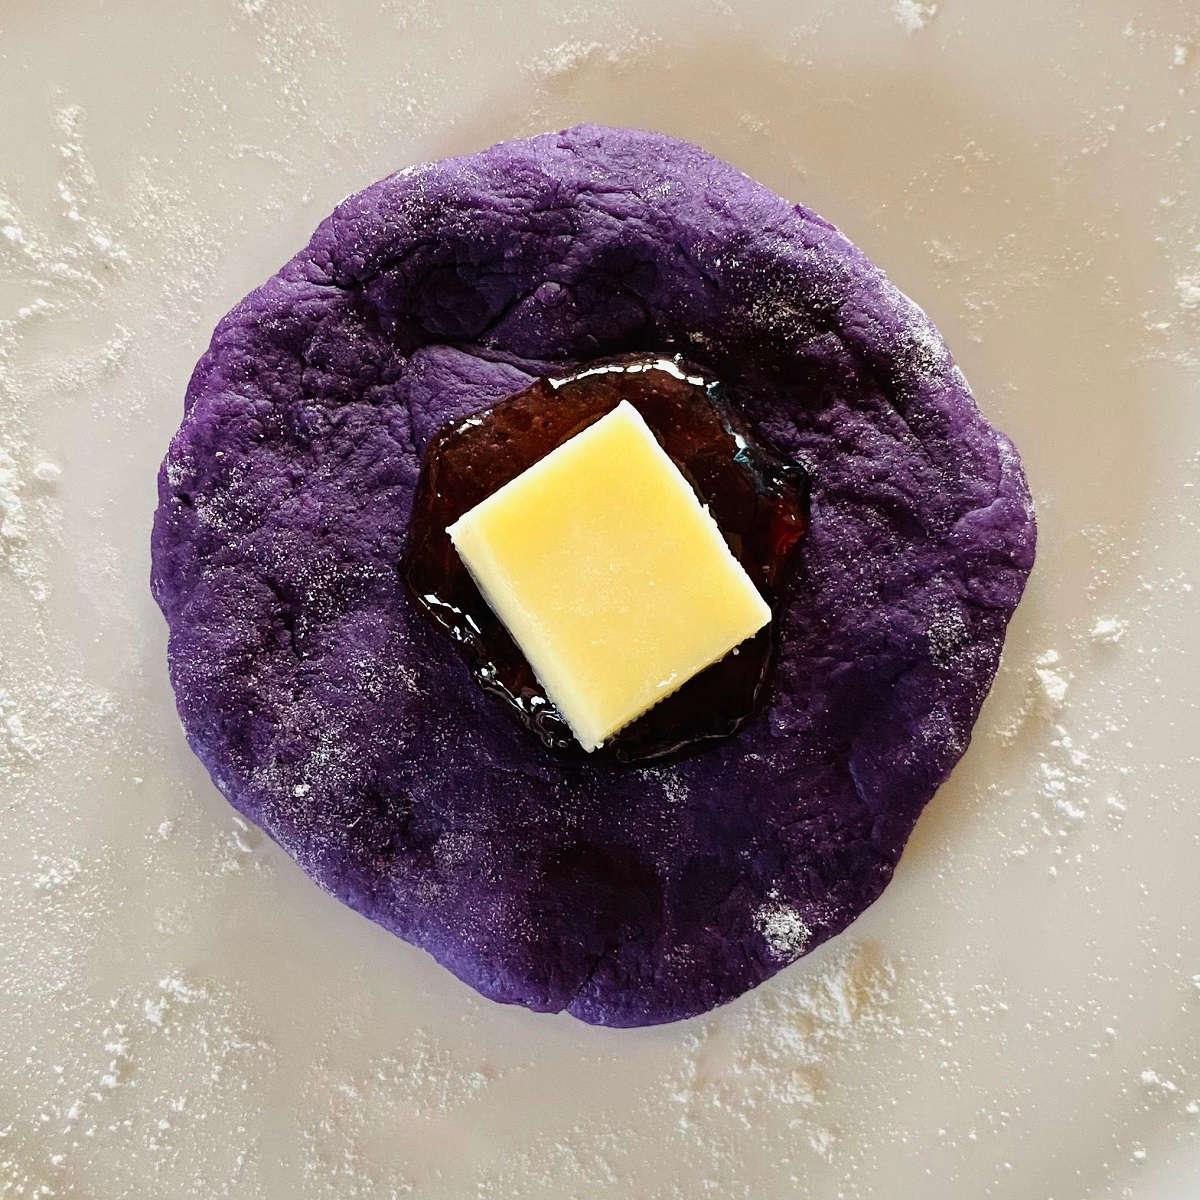 ube cheese pandesal dough with halaya jam and cheese on top